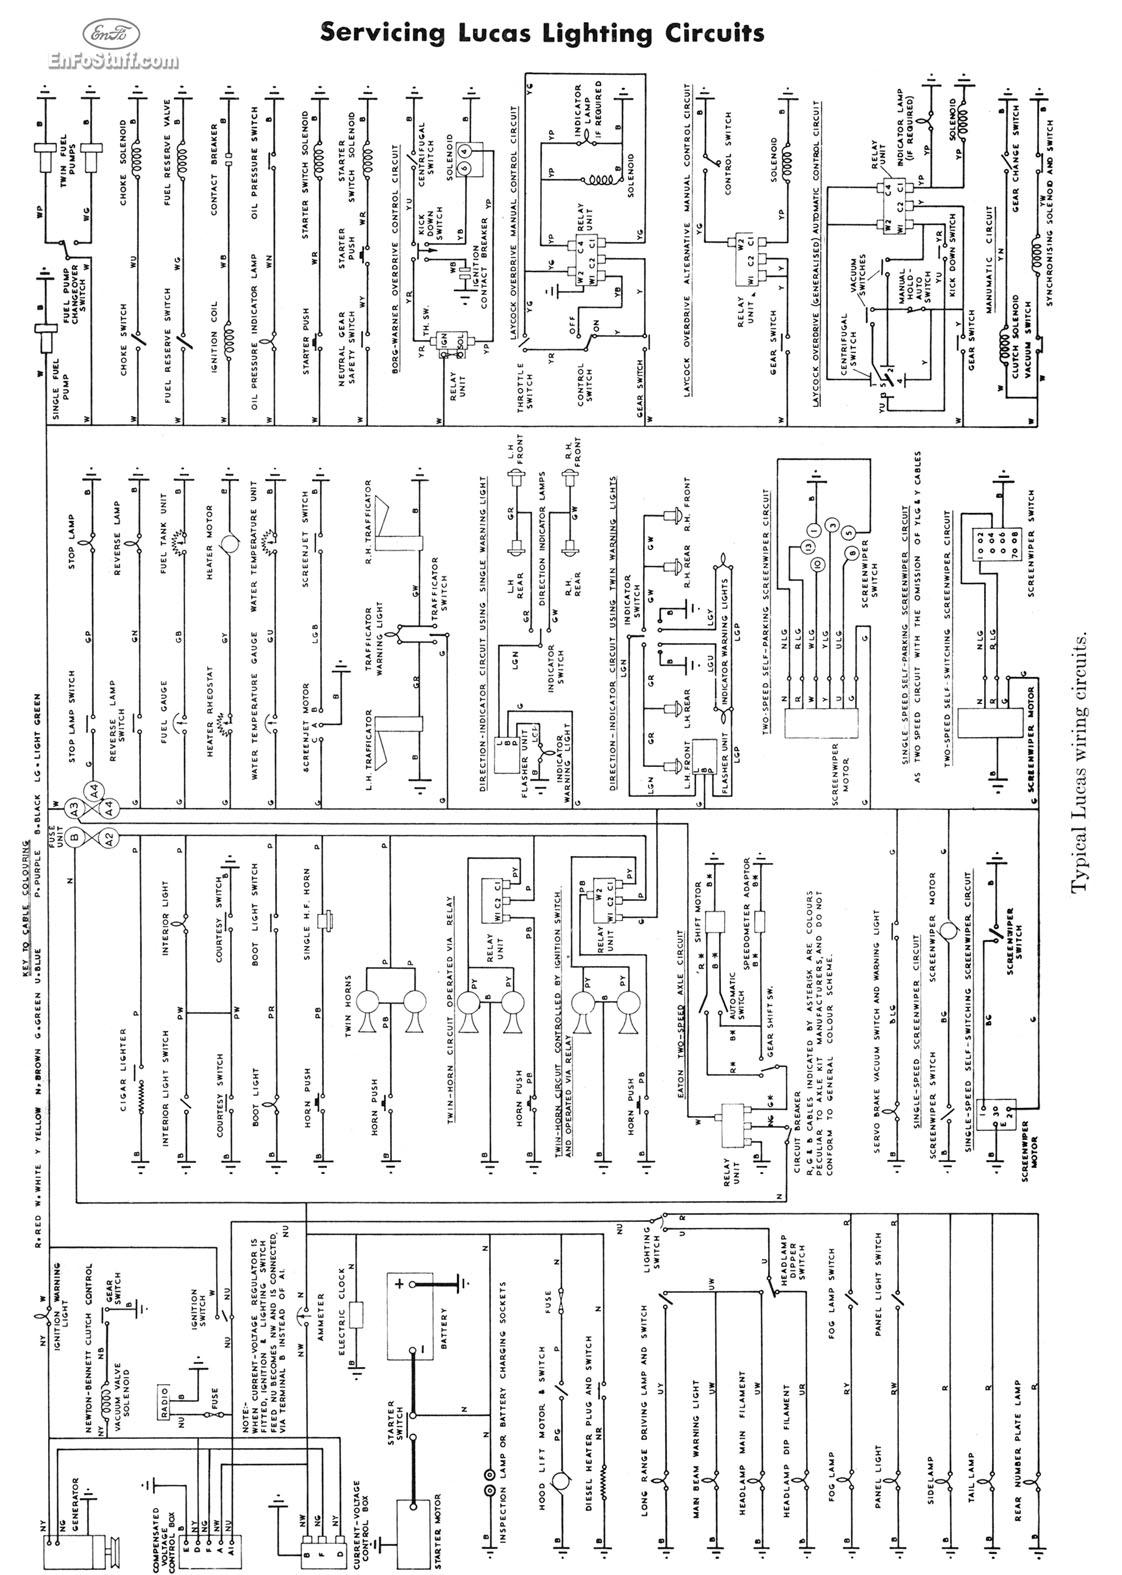 1985 Chevrolet Suburban Wiring Diagram Schematic 2019 Land Rover Defender Indicator